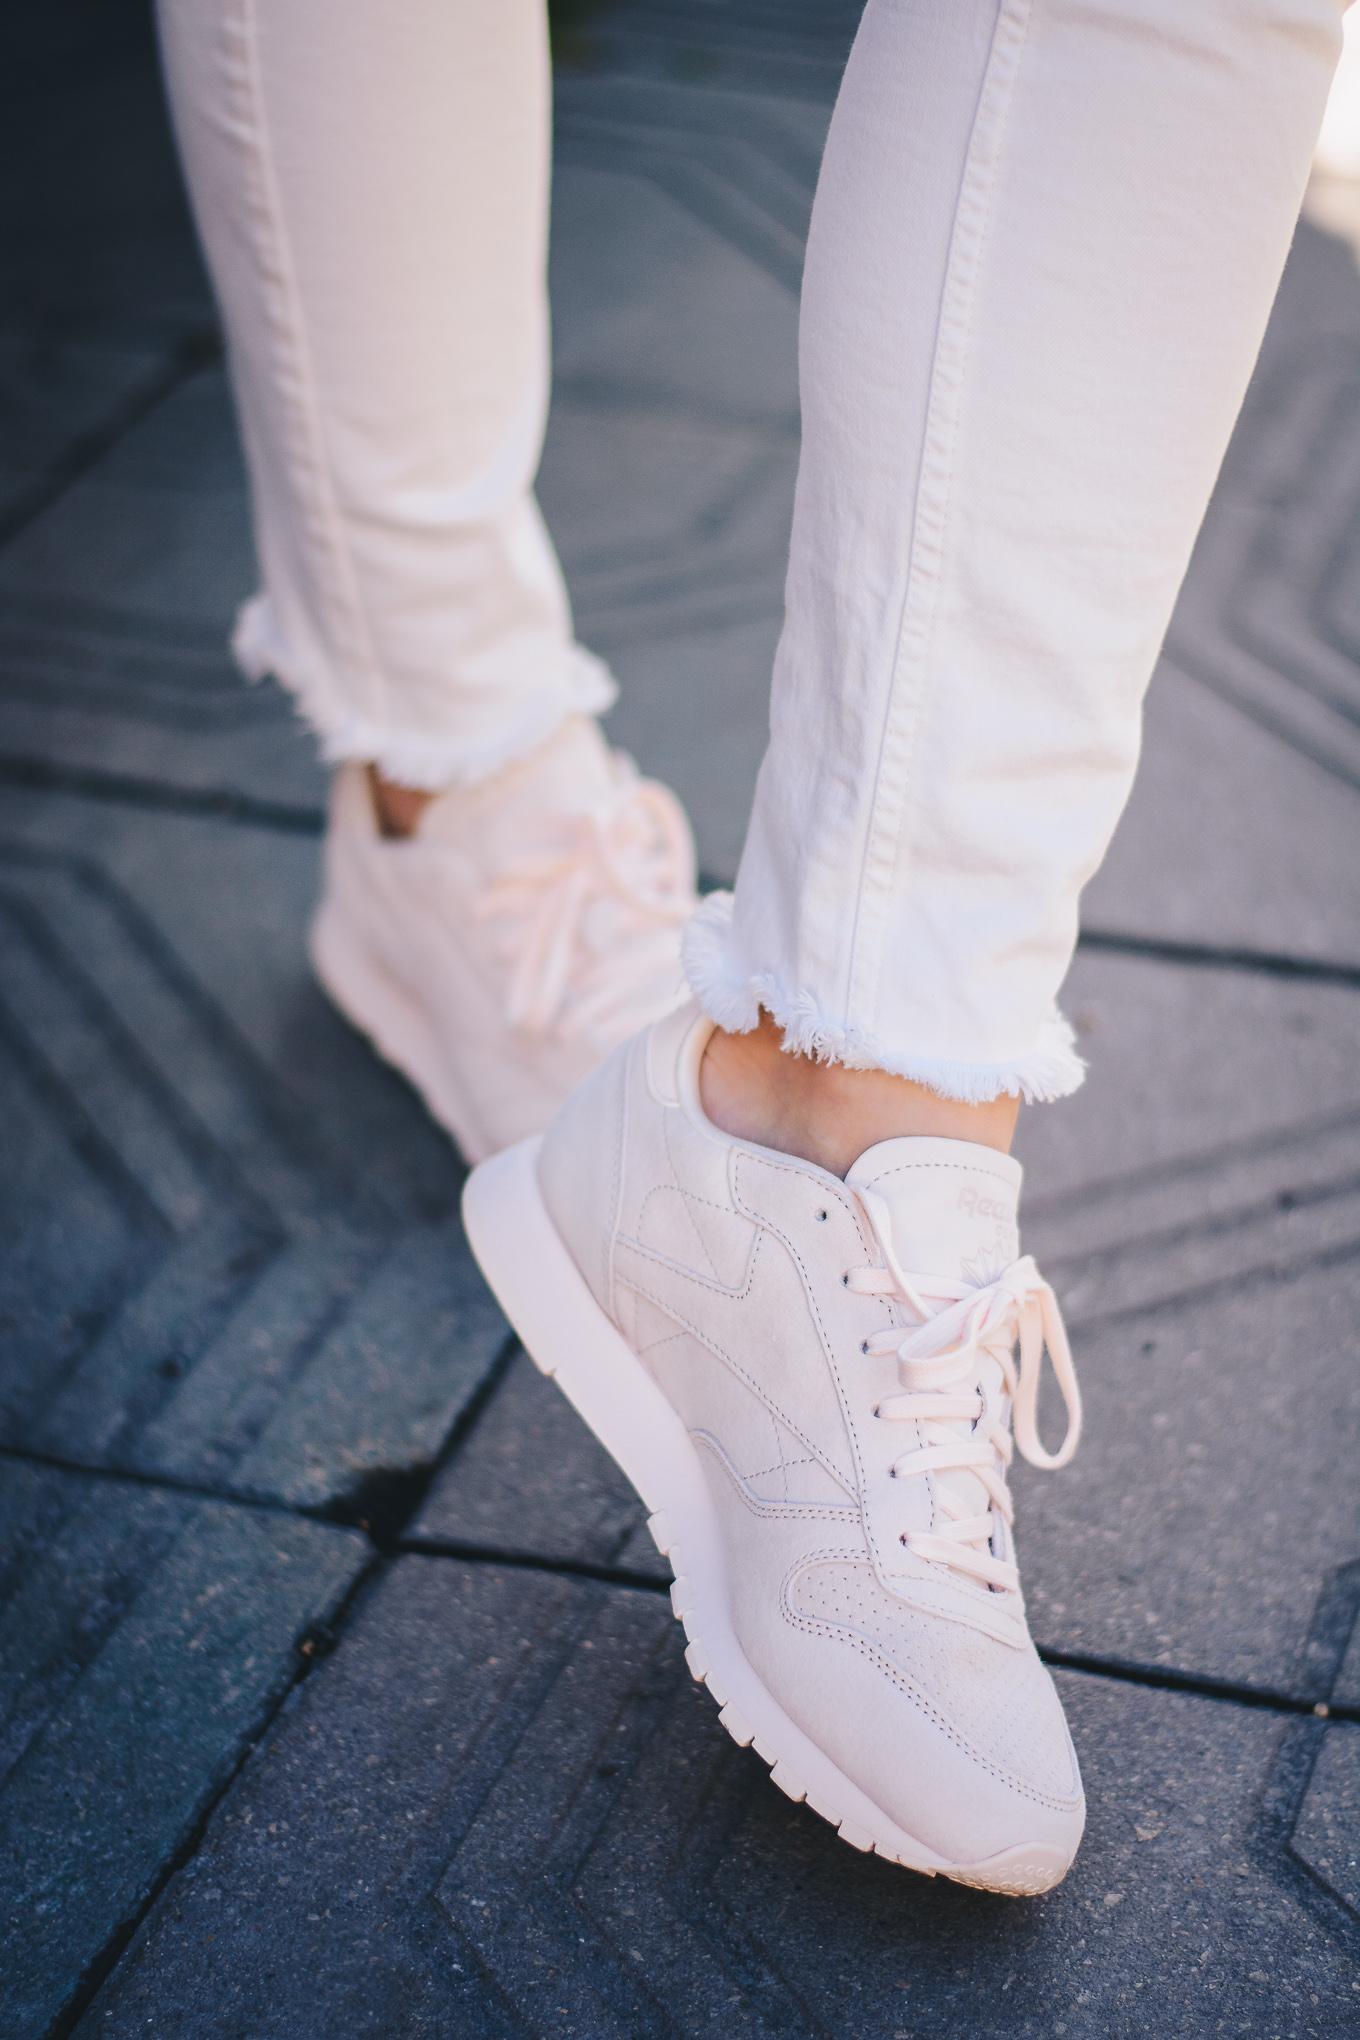 Reebok classic shoes 032018